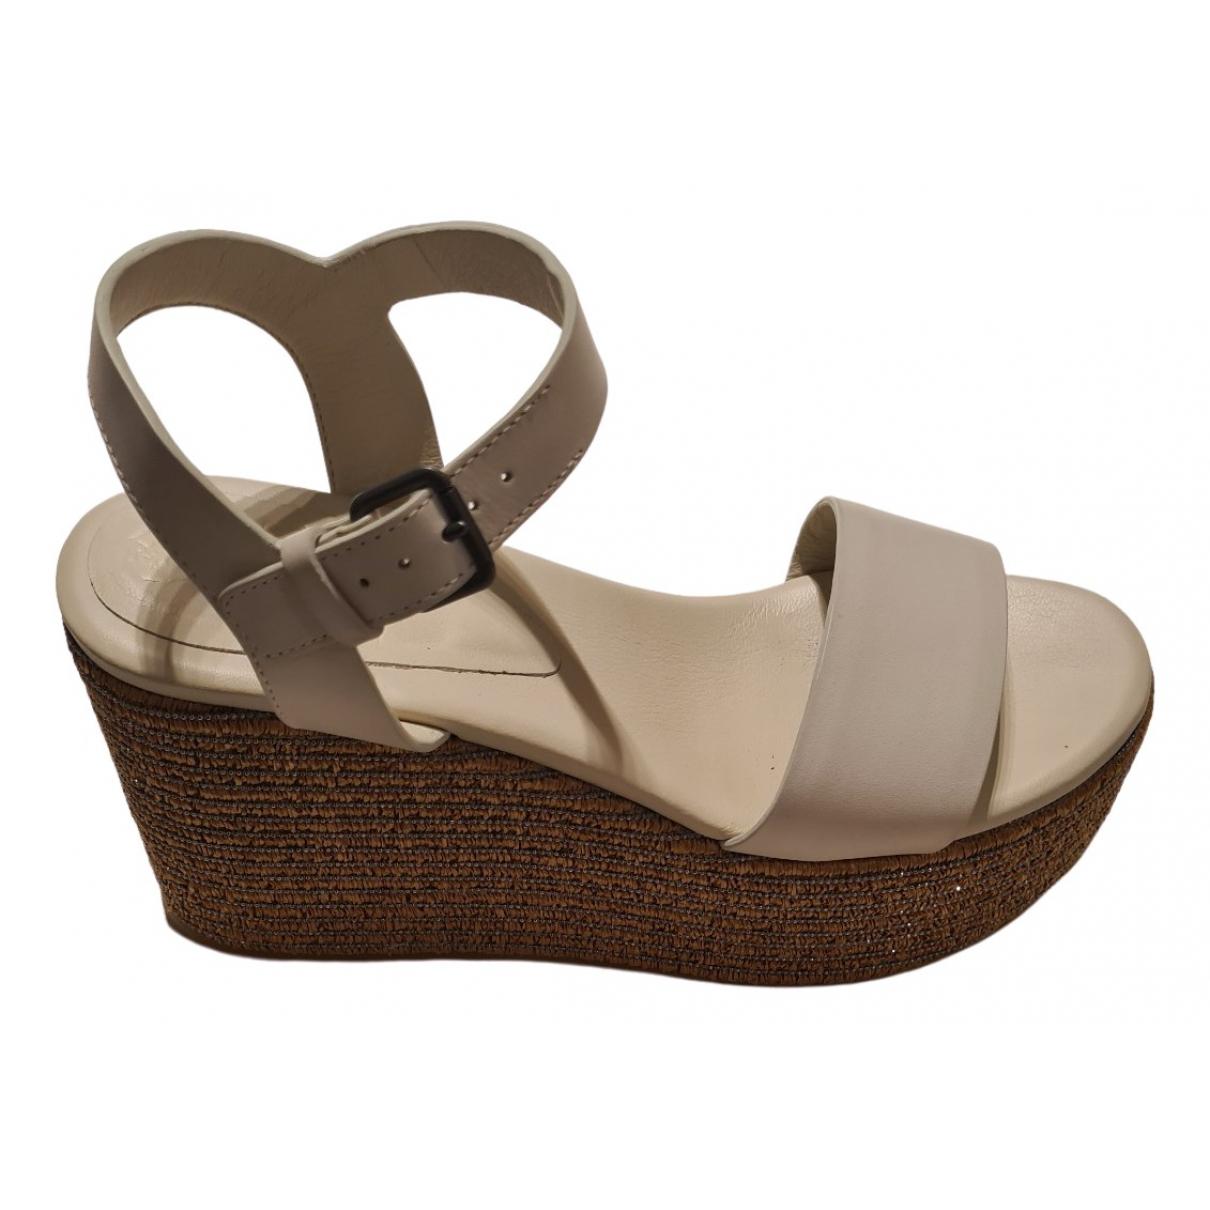 Brunello Cucinelli \N Beige Leather Sandals for Women 35.5 IT